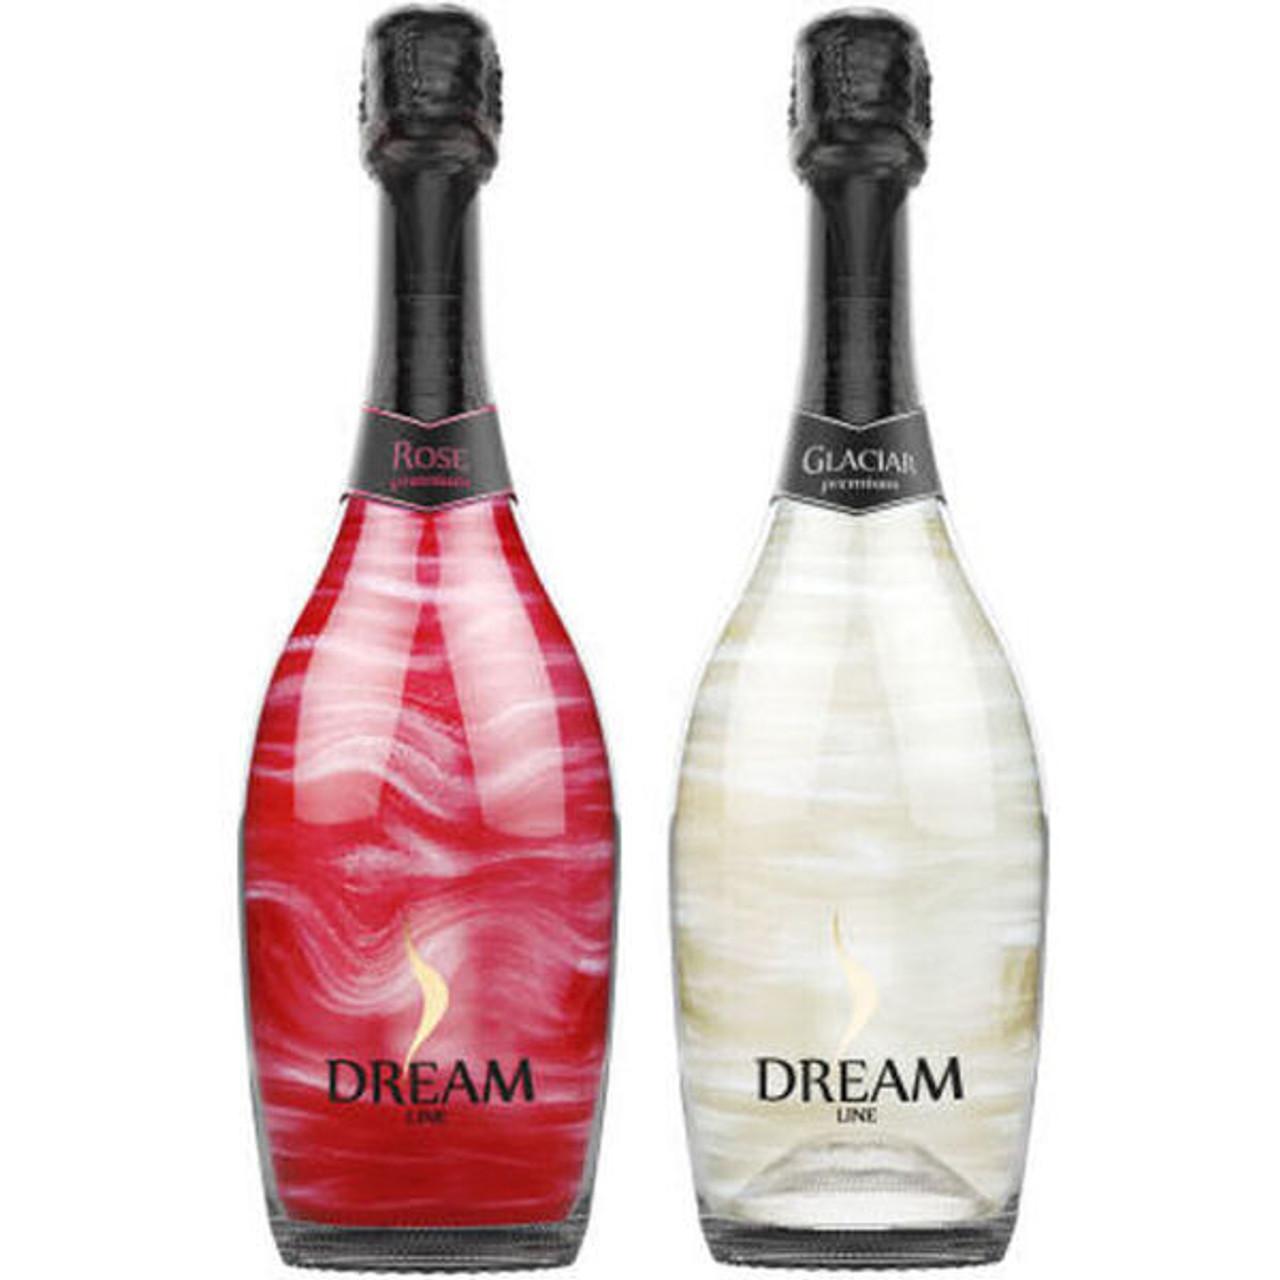 Dream Line Sparkling Wine NV (Spain) 2-Pack